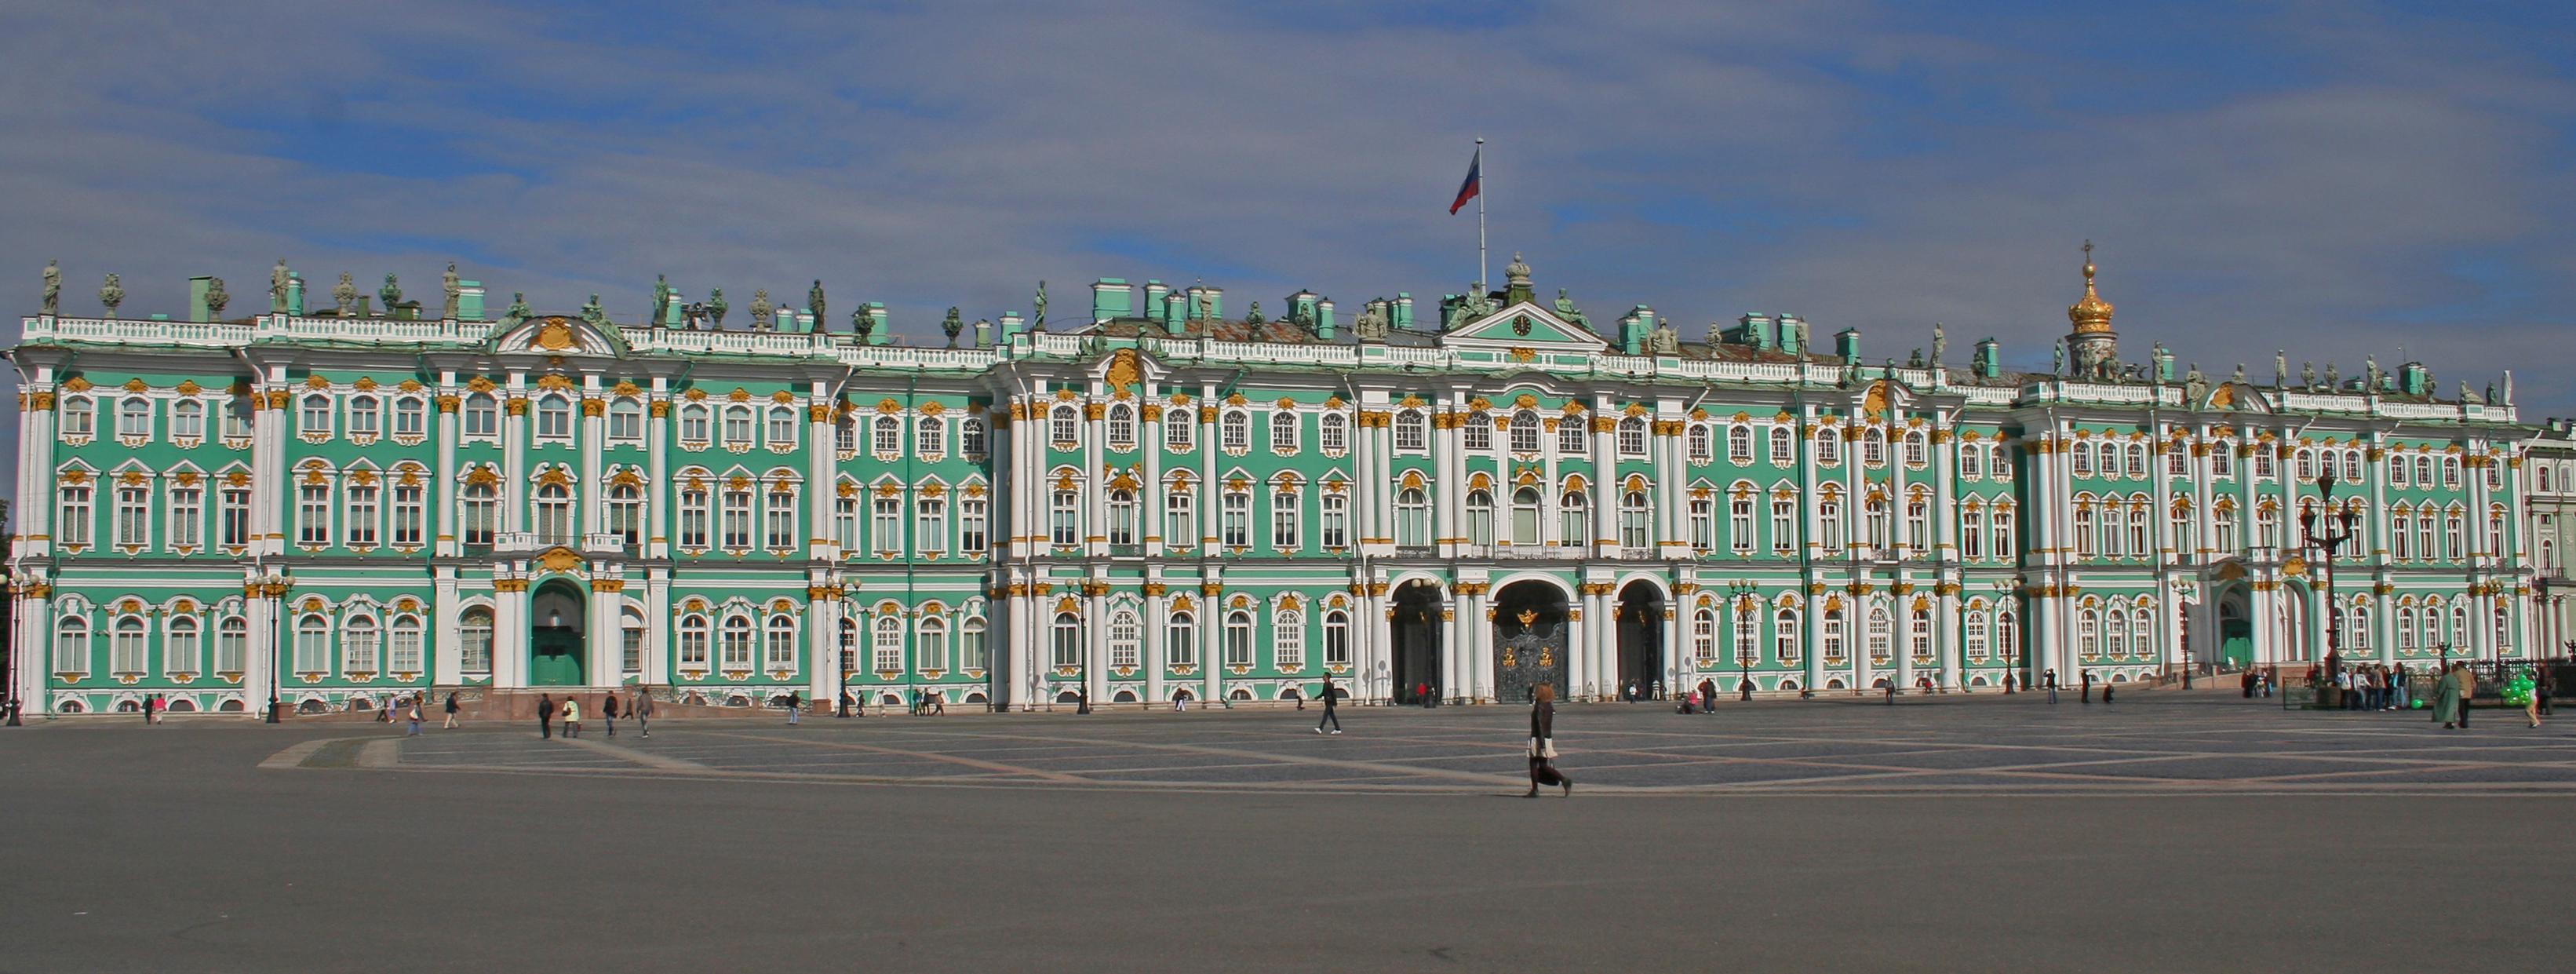 Winter_Palace_SPB_from_Palace_Square.jpg